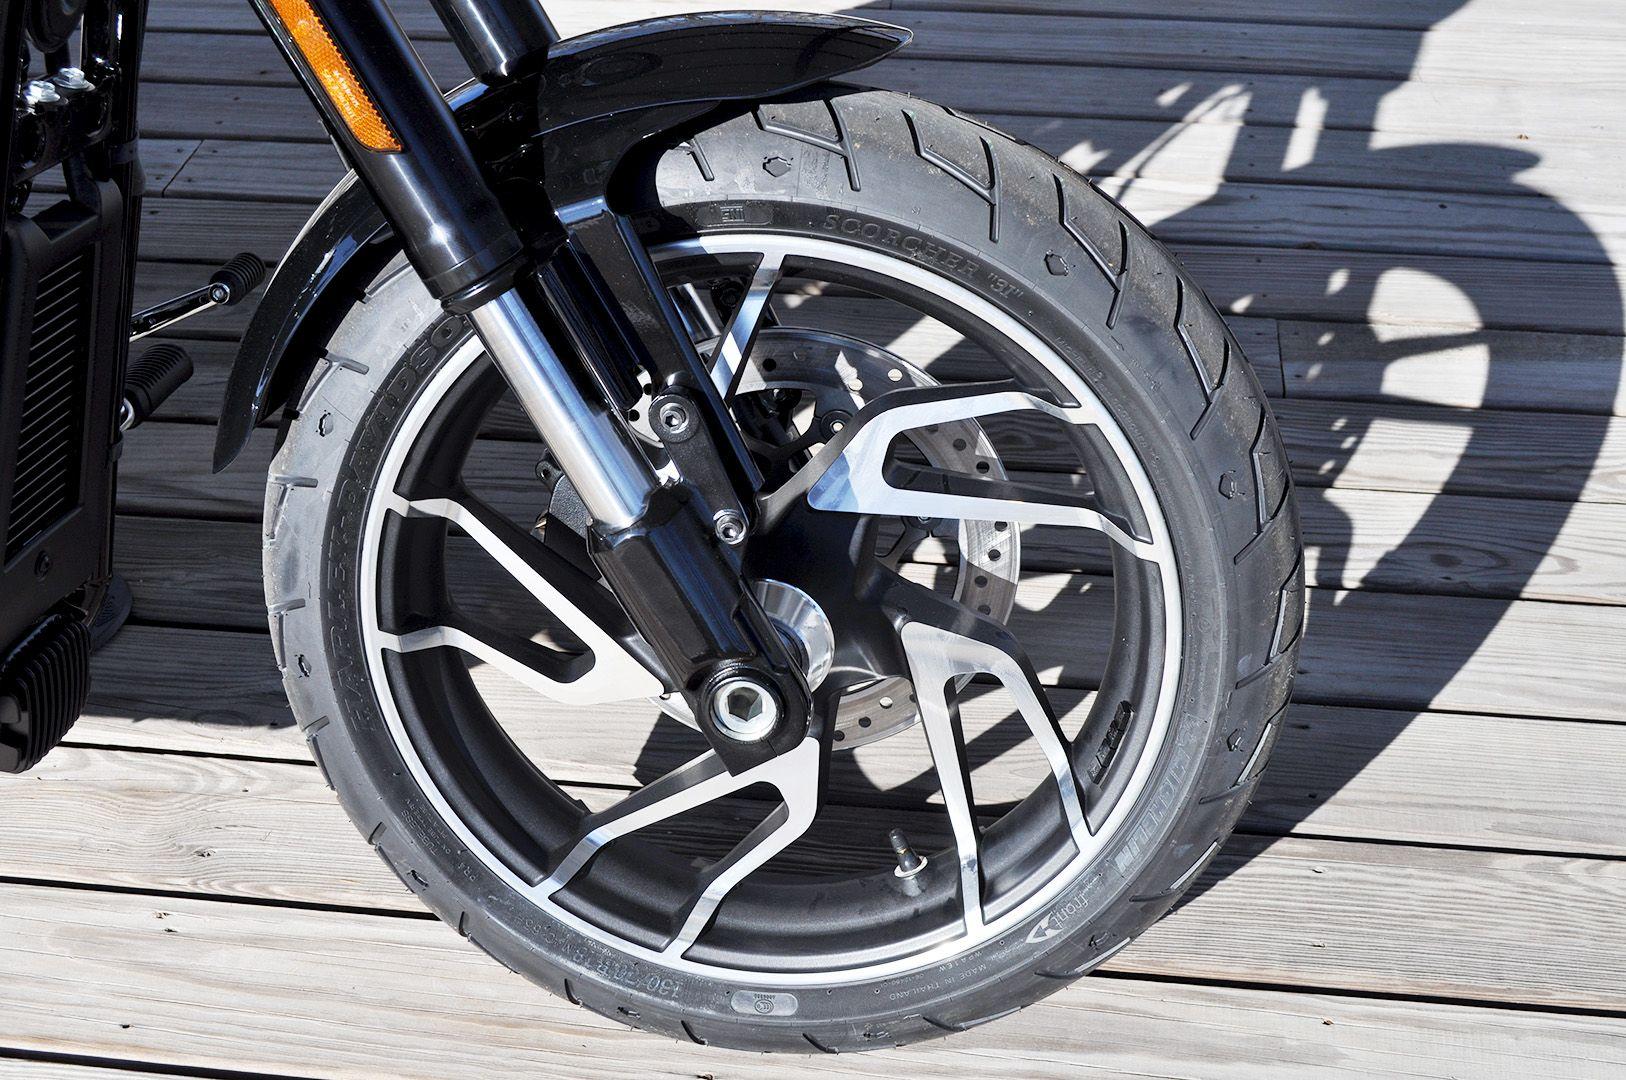 New 2021 Harley-Davidson Sport Glide